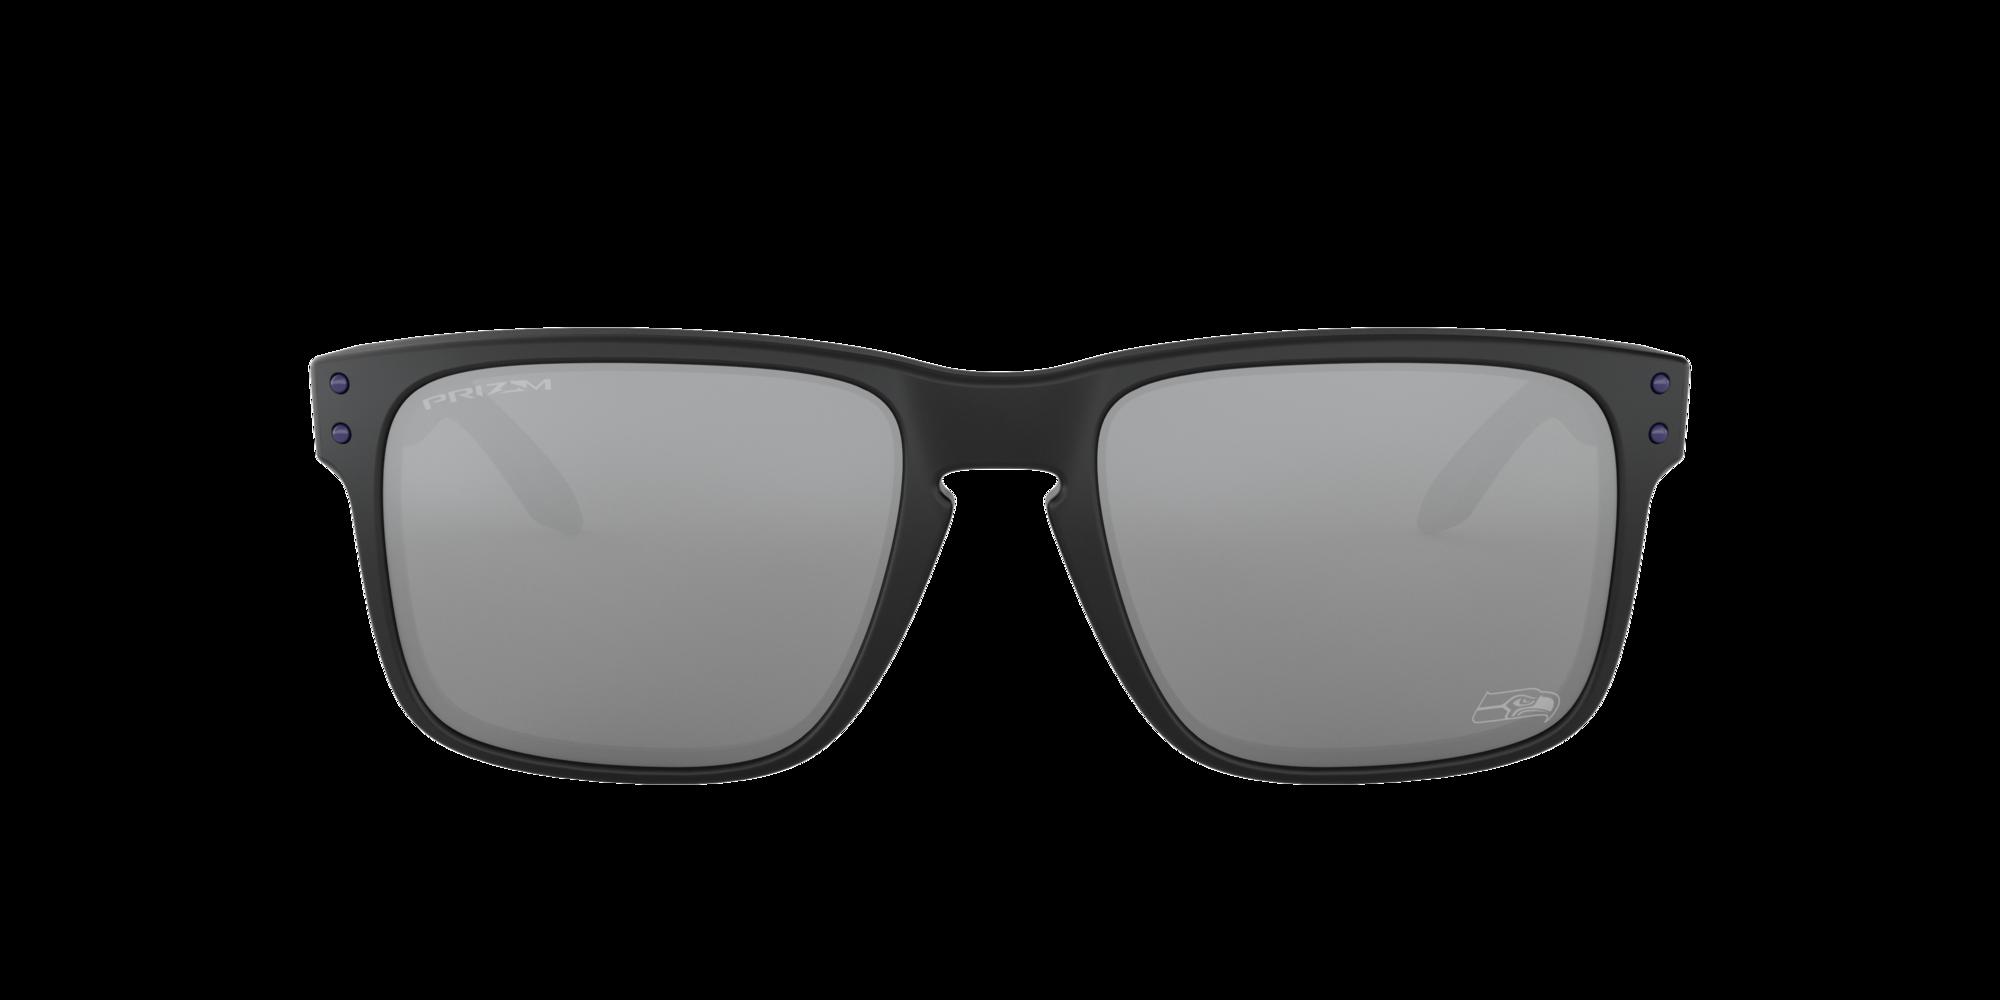 Image for OO9102 55 HOLBROOK from LensCrafters   Glasses, Prescription Glasses Online, Eyewear